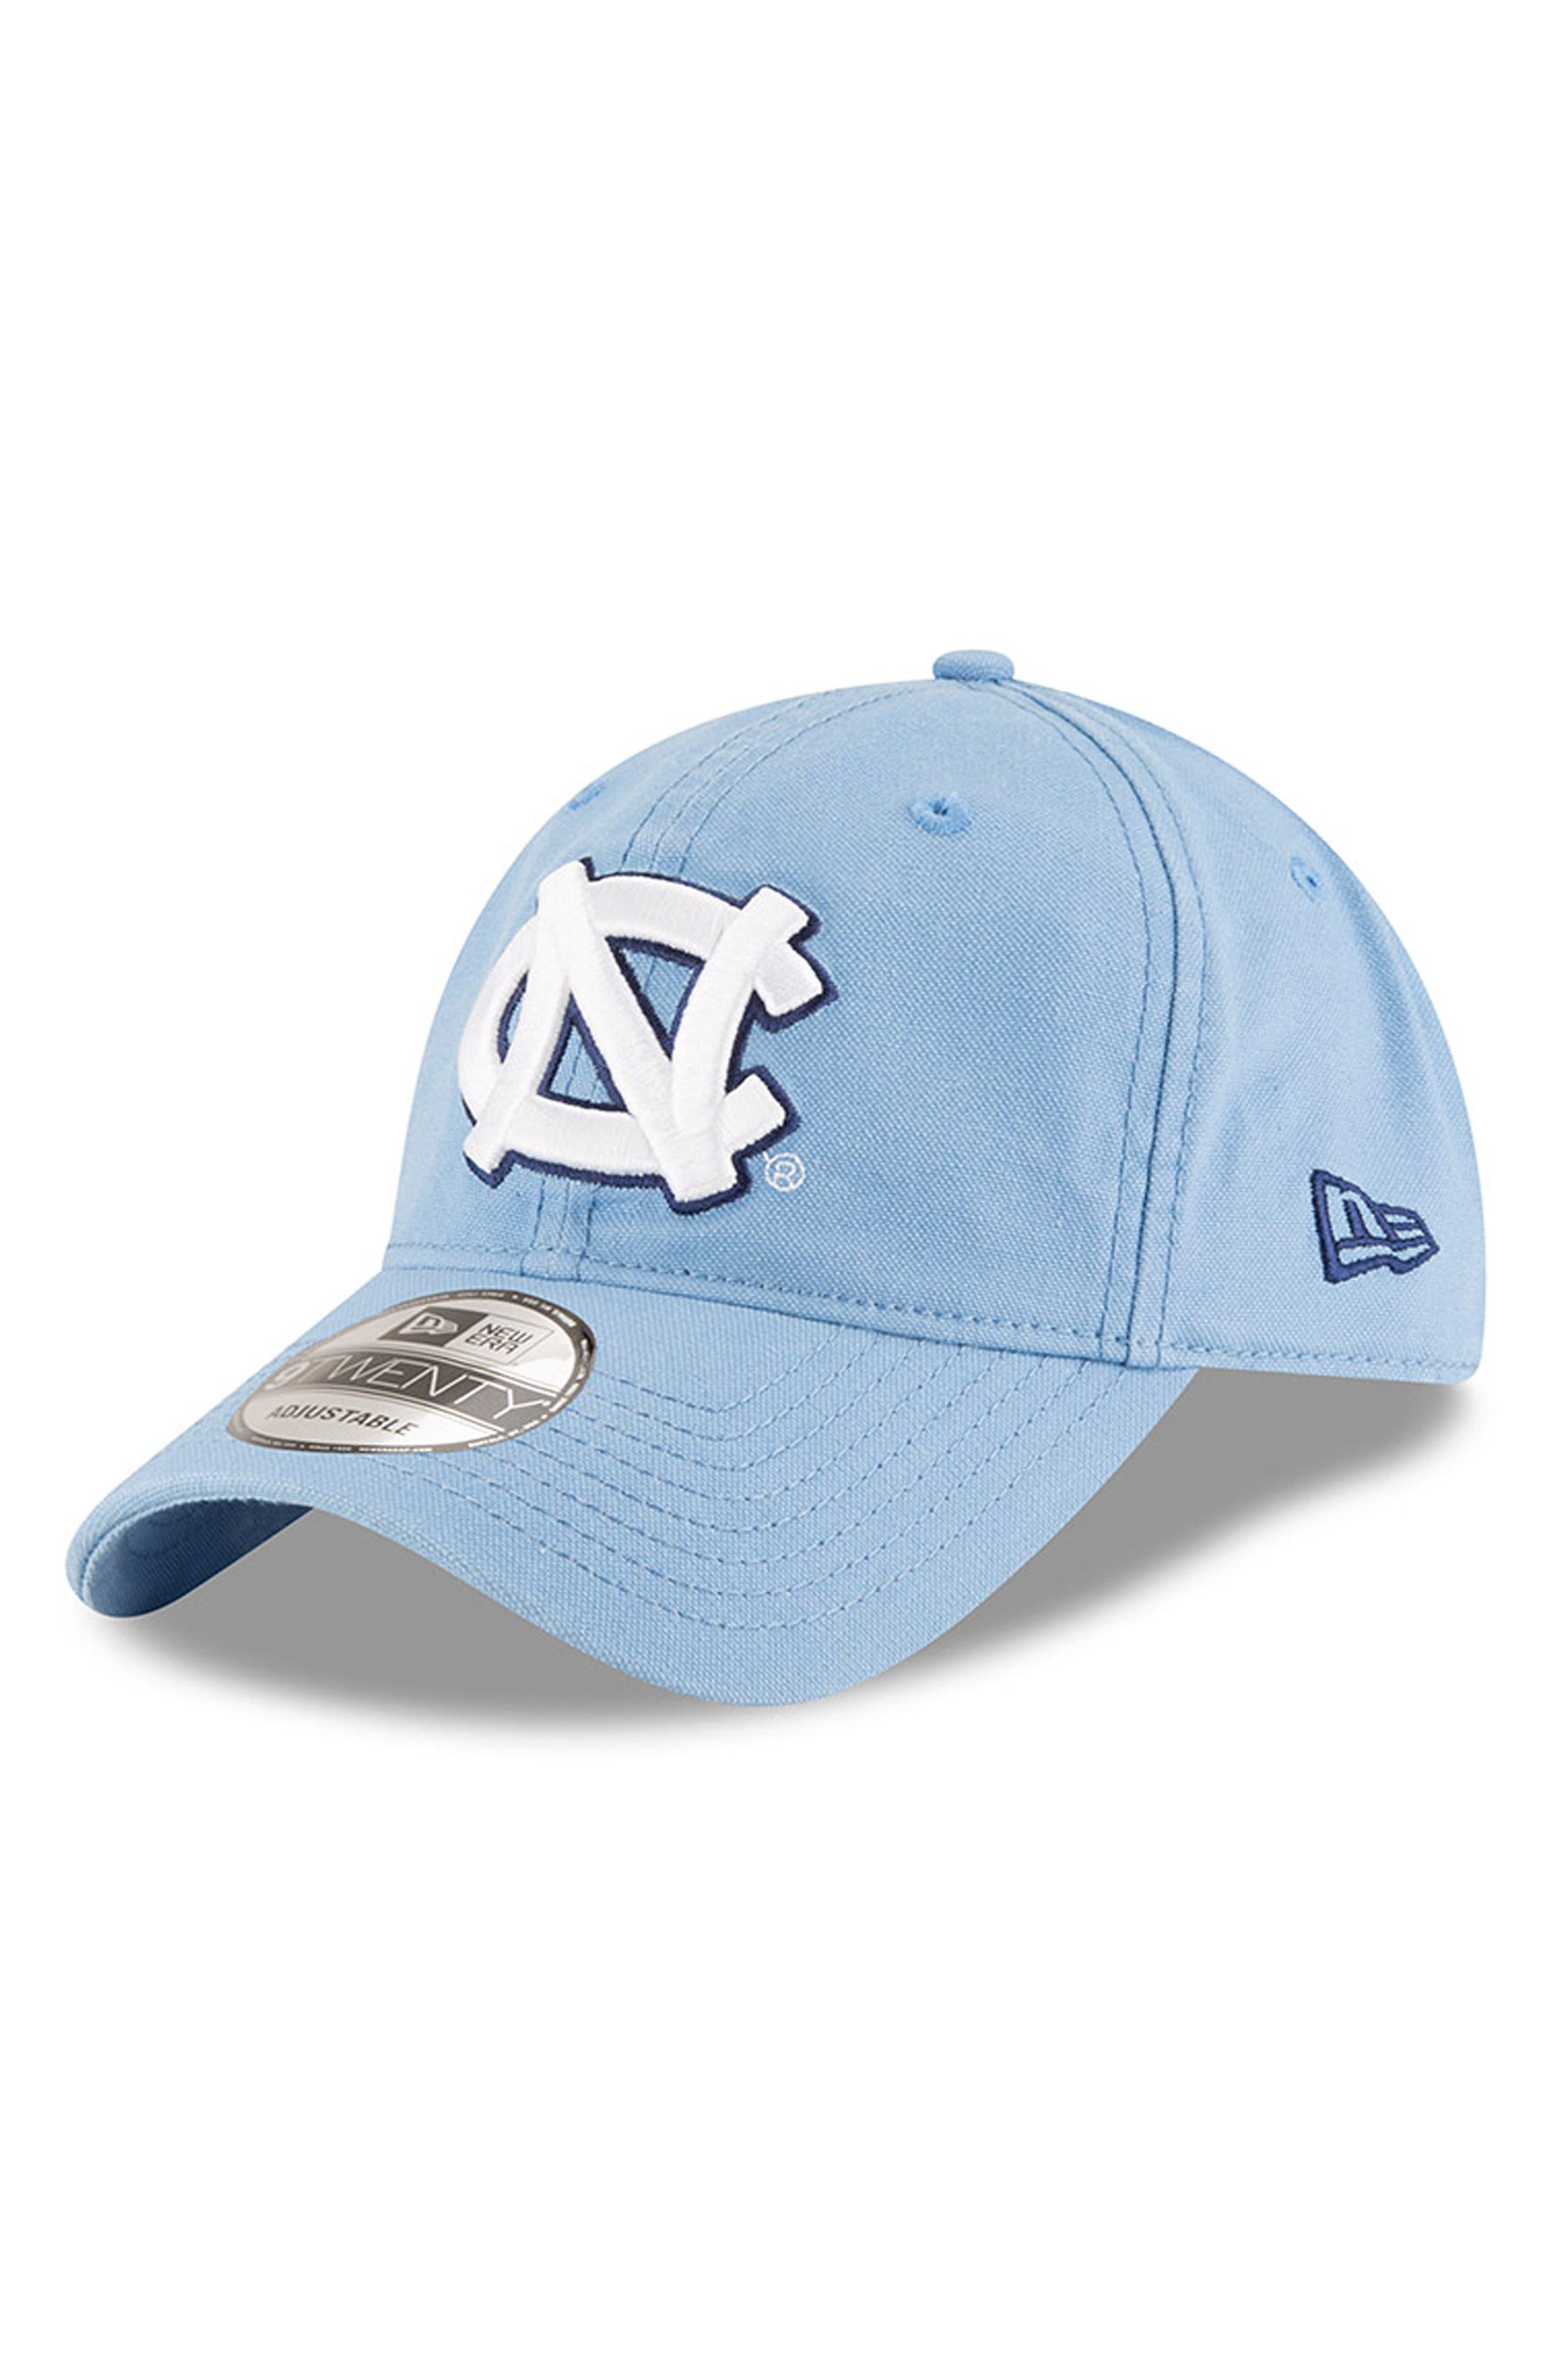 New Era Collegiate Core Classic - North Carolina Tar Heels Baseball Cap,                             Alternate thumbnail 5, color,                             450